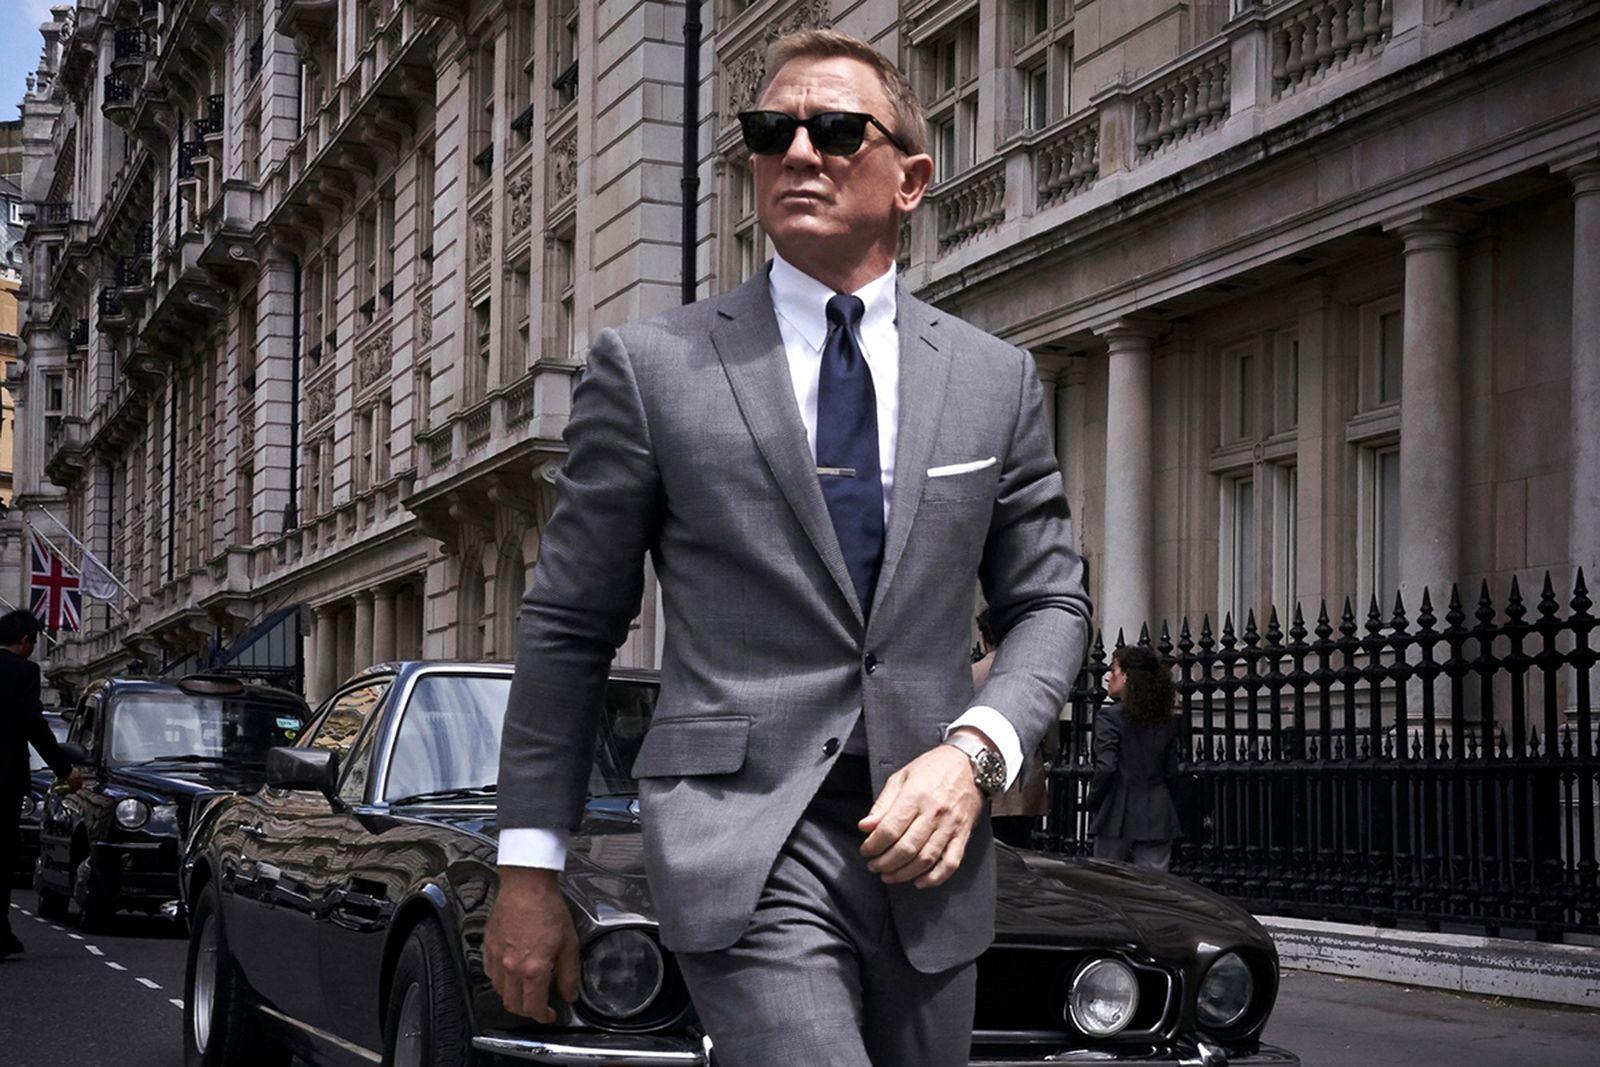 Daniel Craig James Bond suit tie sunglasses